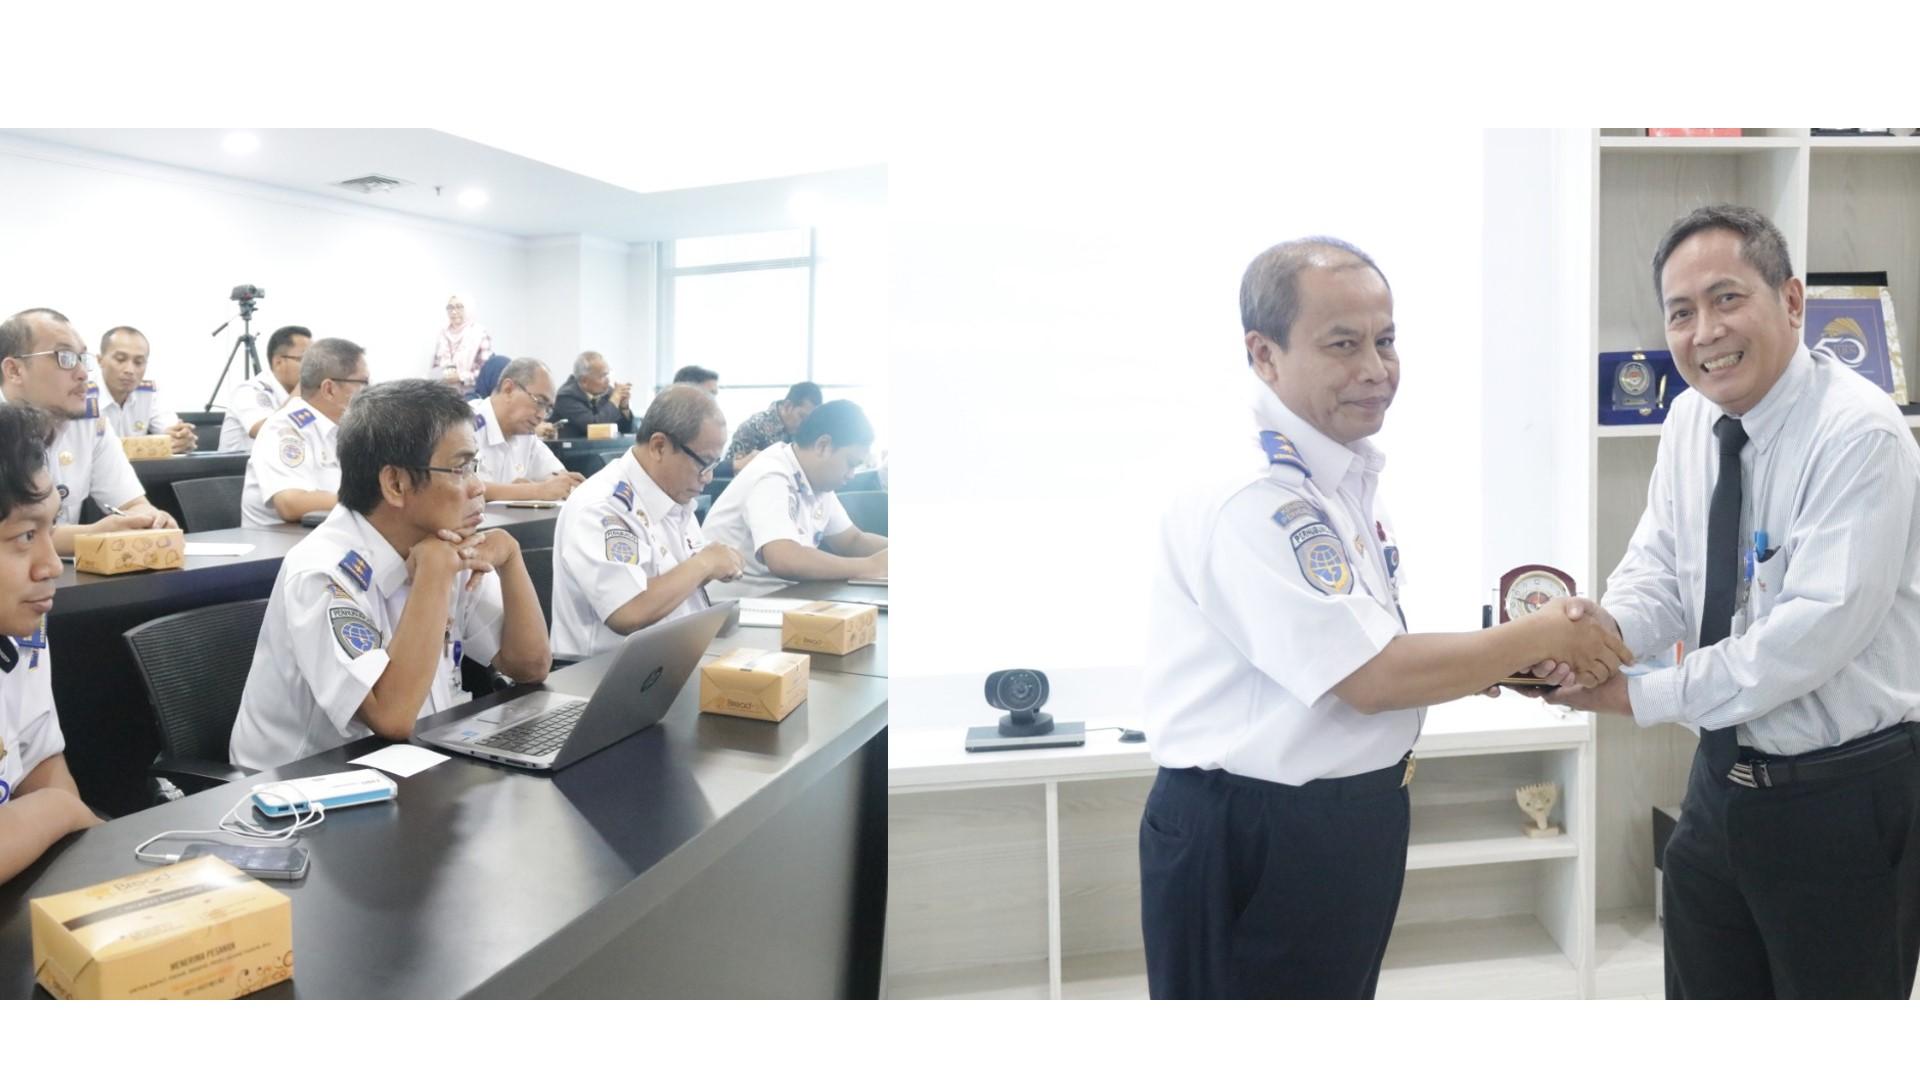 Meningkatkan Fungsi Assurance dan Consulting Itjenhub Dalam Organisasi Melalui Pola Hubungan Tortama dan Bidang Investigasi